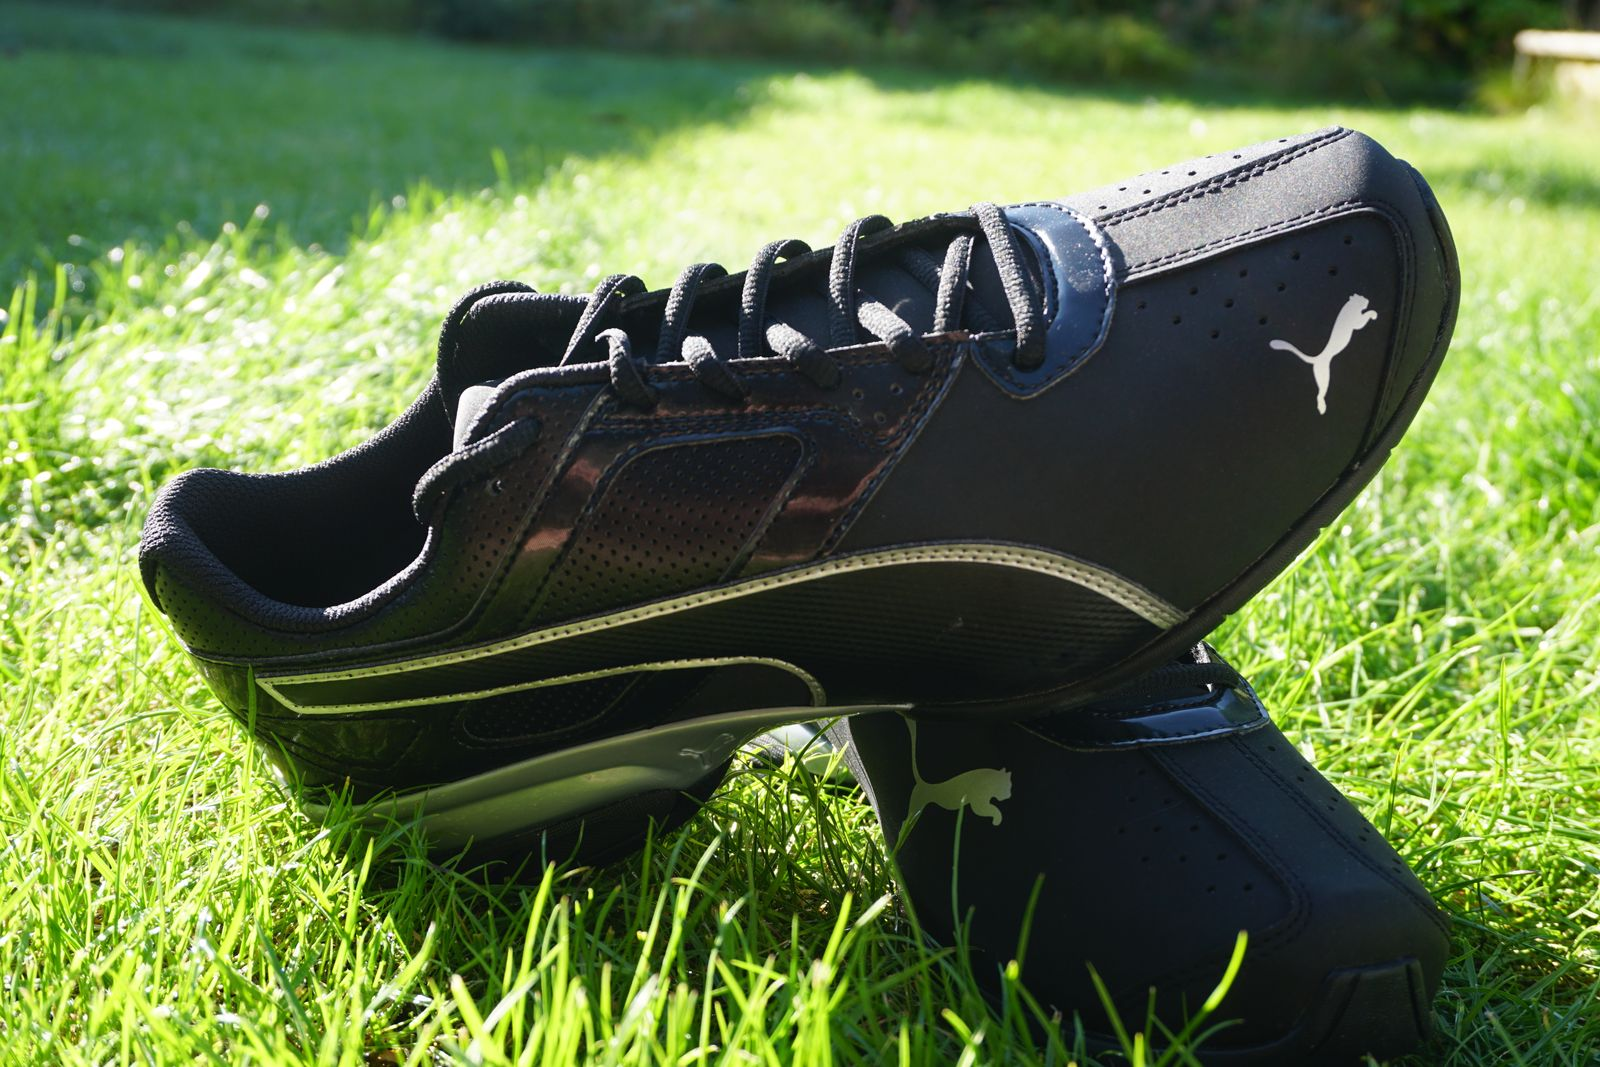 Laufschuh-Test